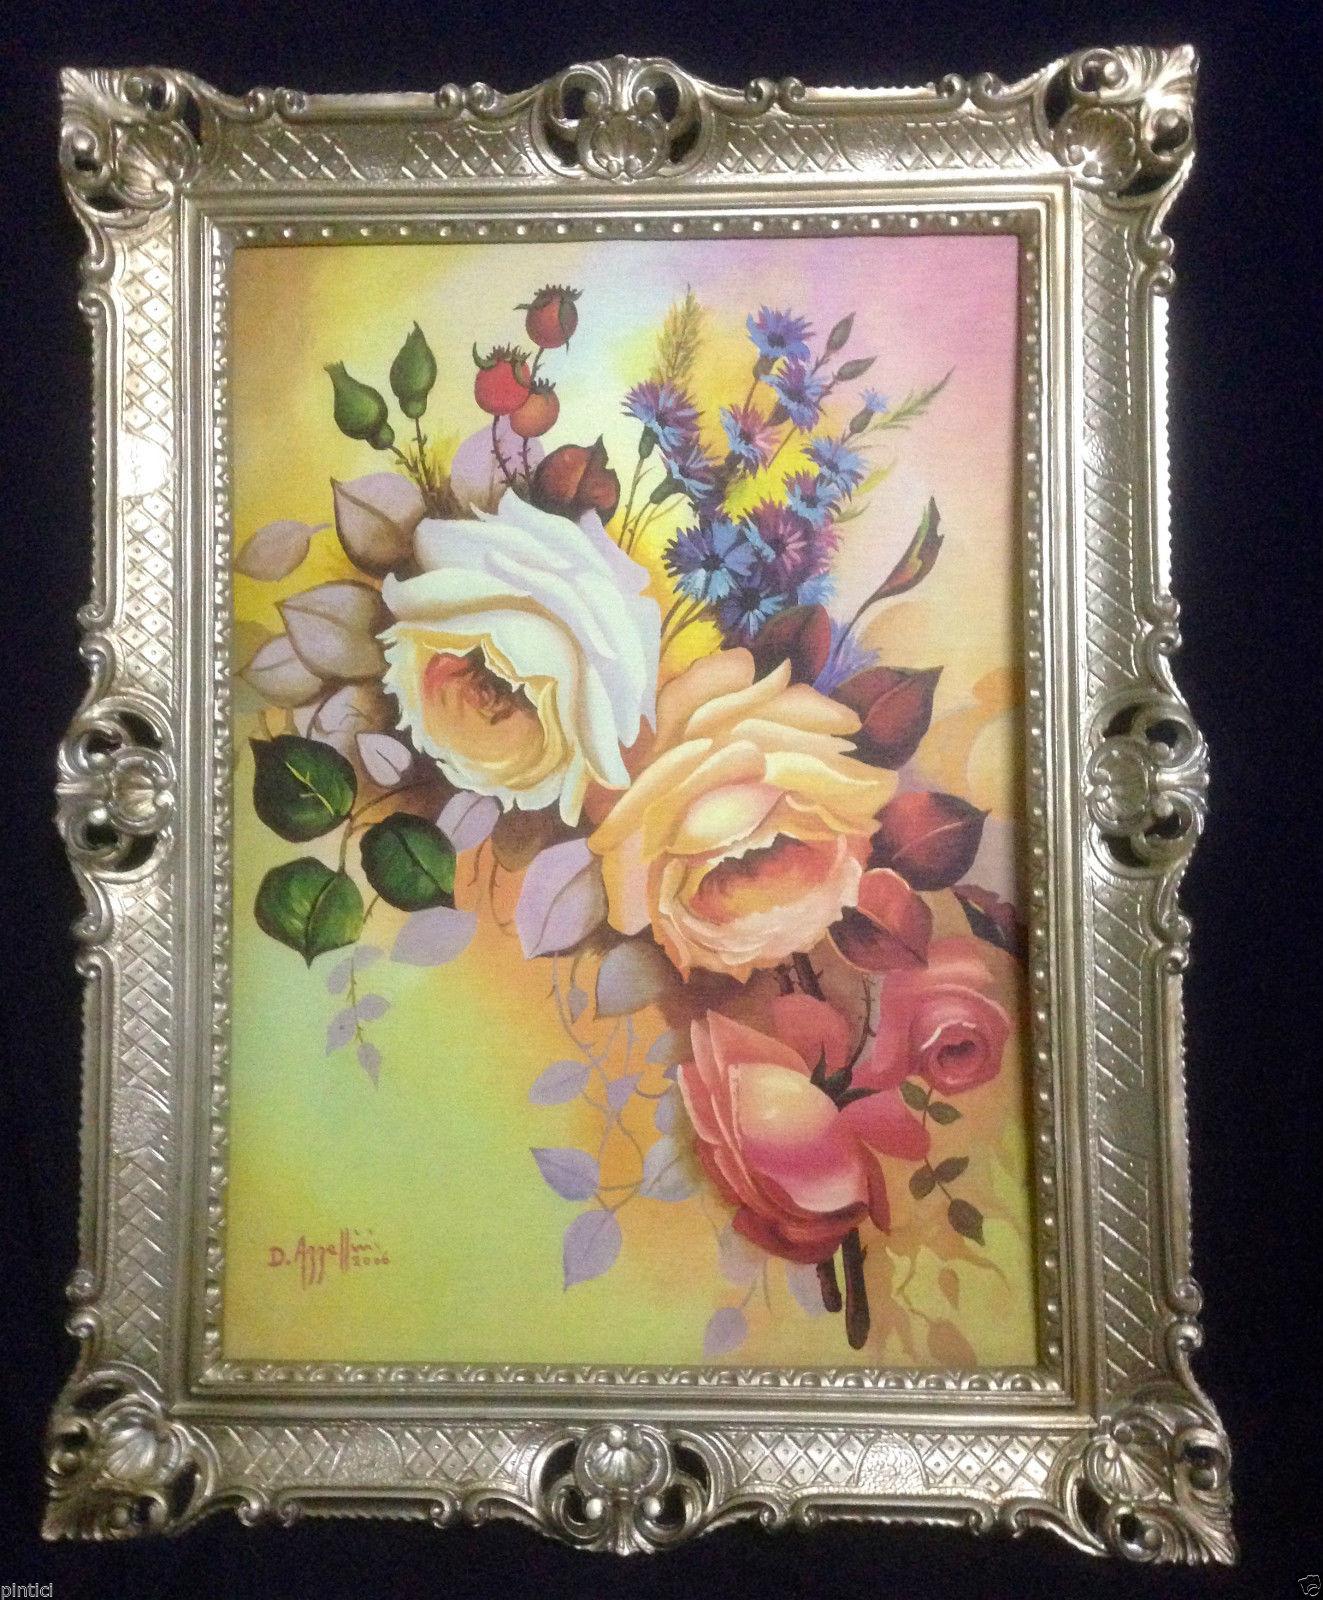 Gerahmte Gemälde BLUMEN Rosen Bild 90X70 Rosenbilder Bild mit Rahmen ...